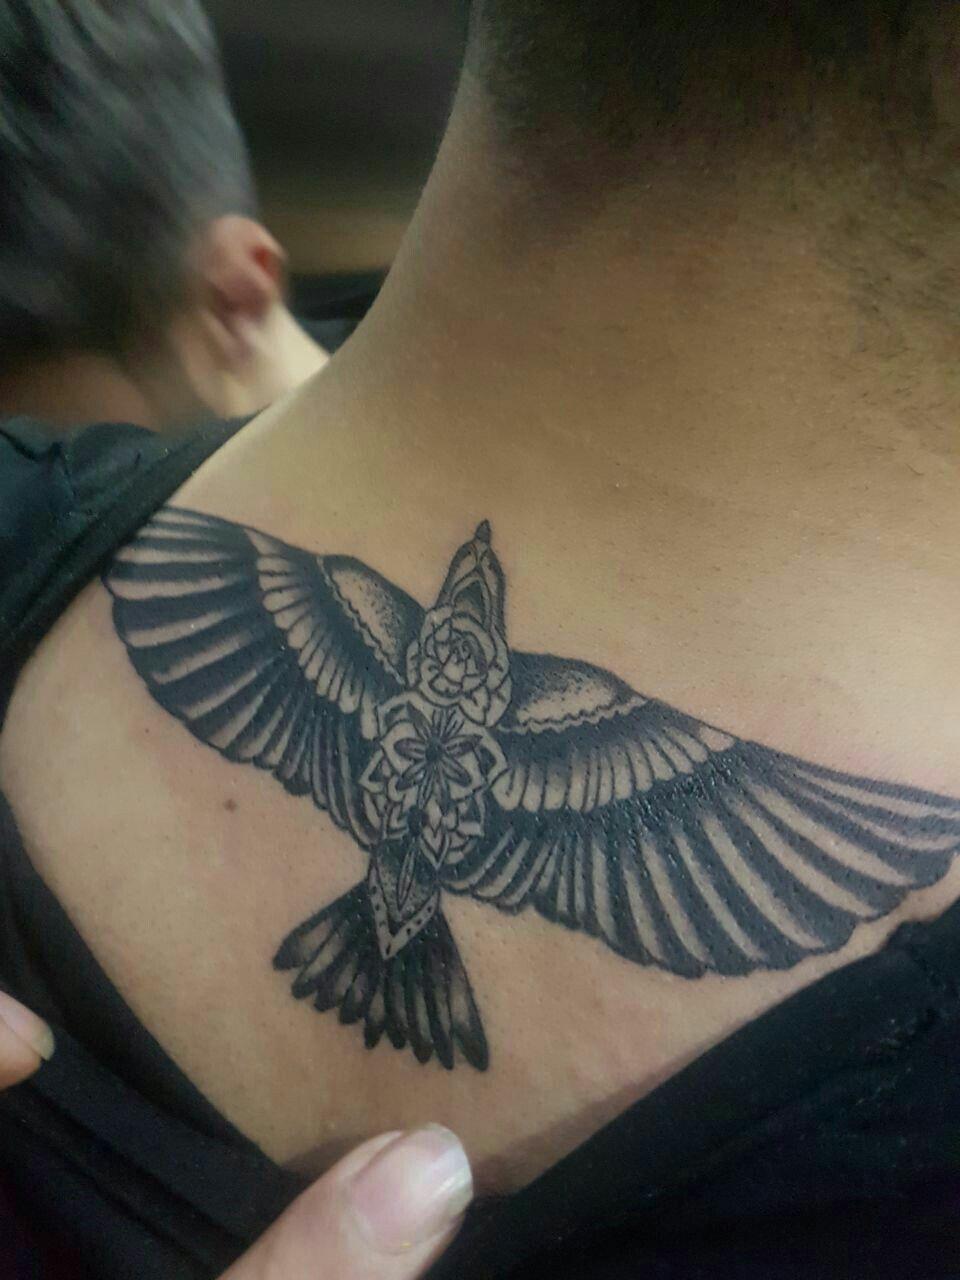 Bird Neck Tattoos For Guys : tattoos, Tattoo, Behind, Guys,, Tattoo,, Tattoos